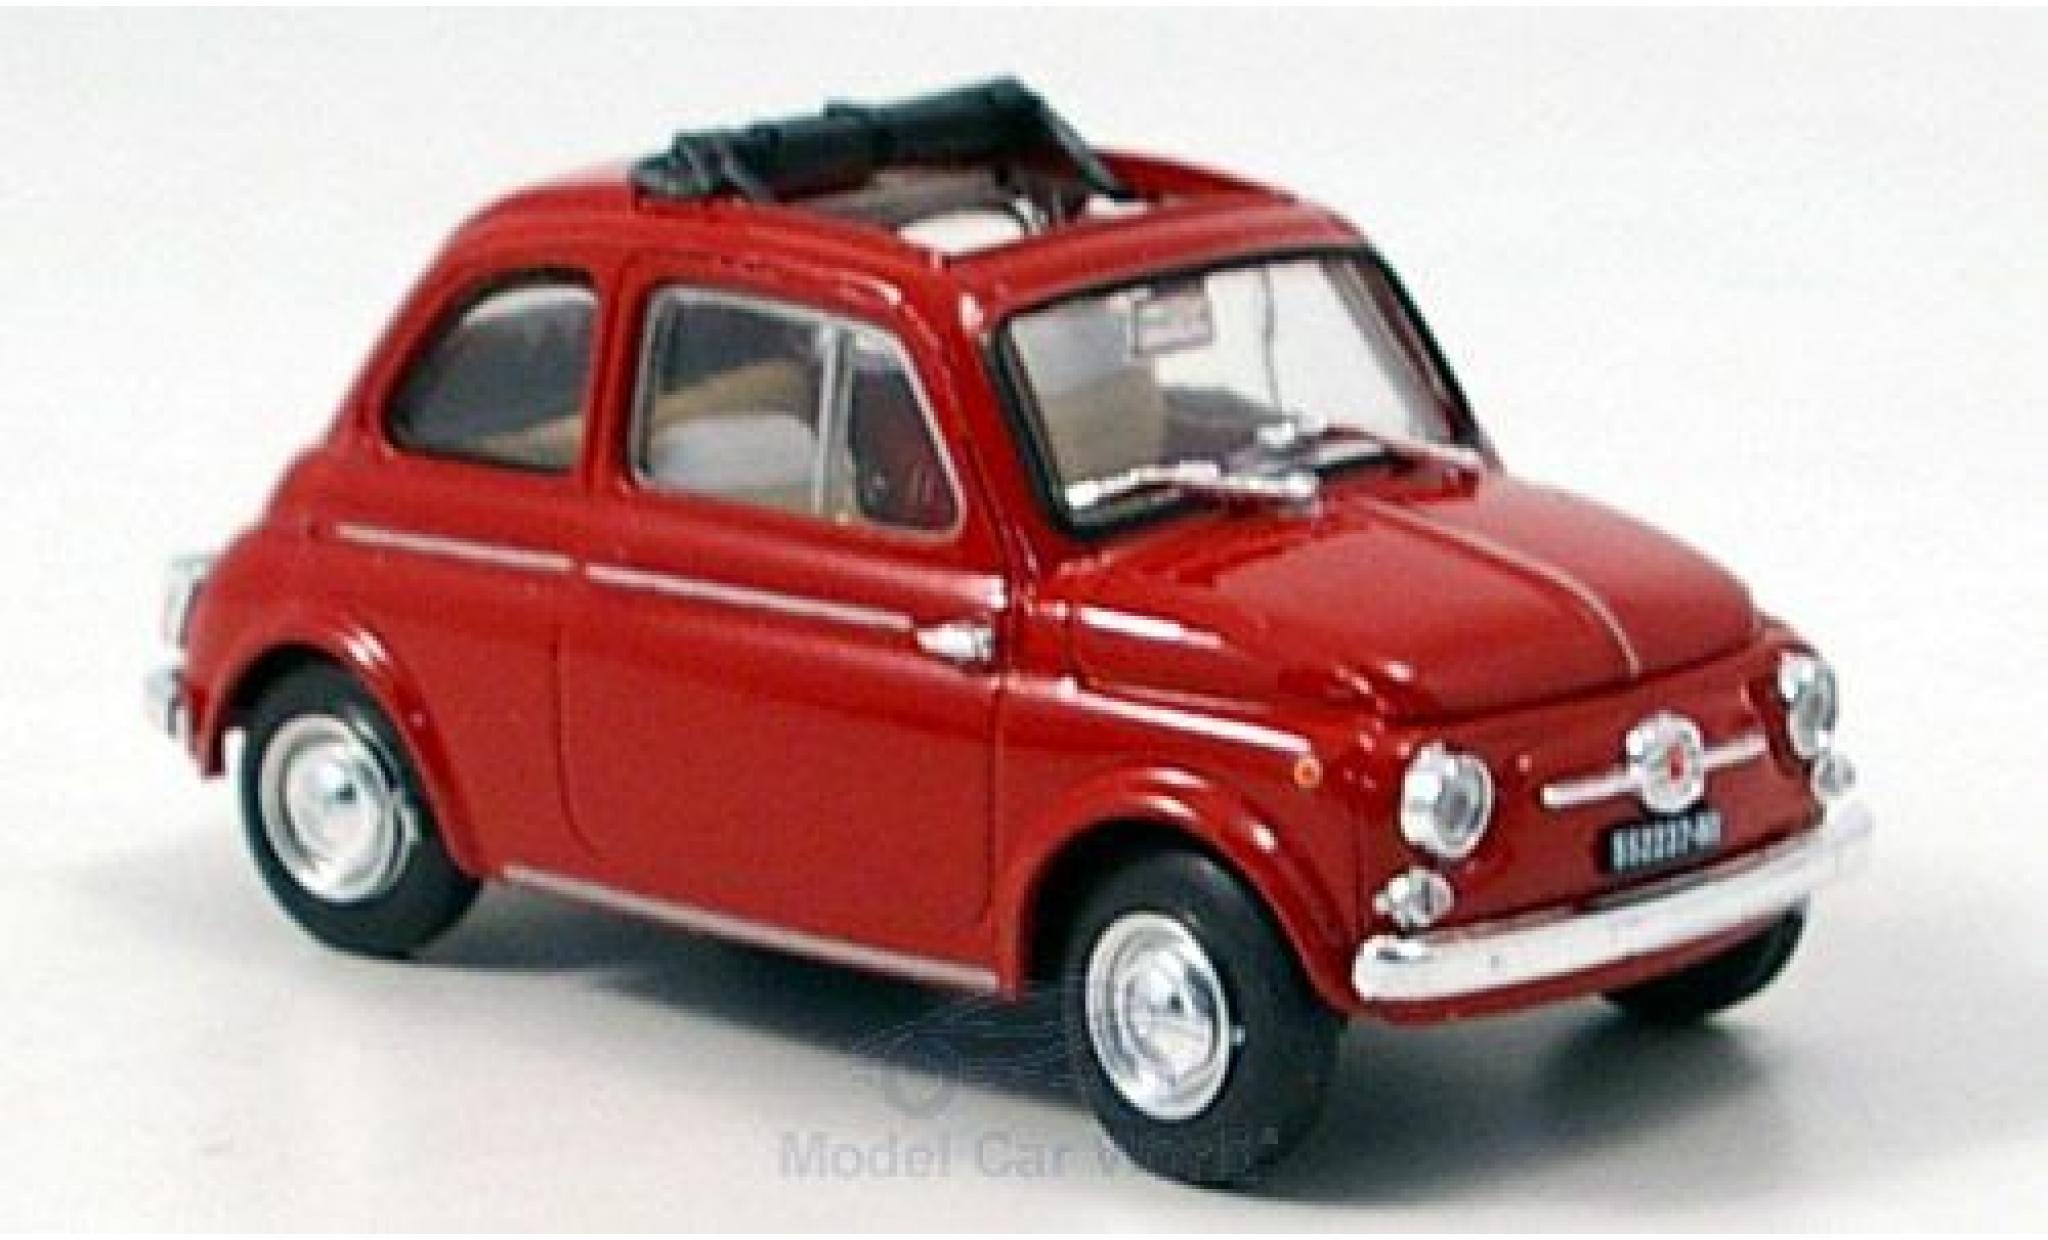 Fiat 500 1/43 Brumm D red 1960